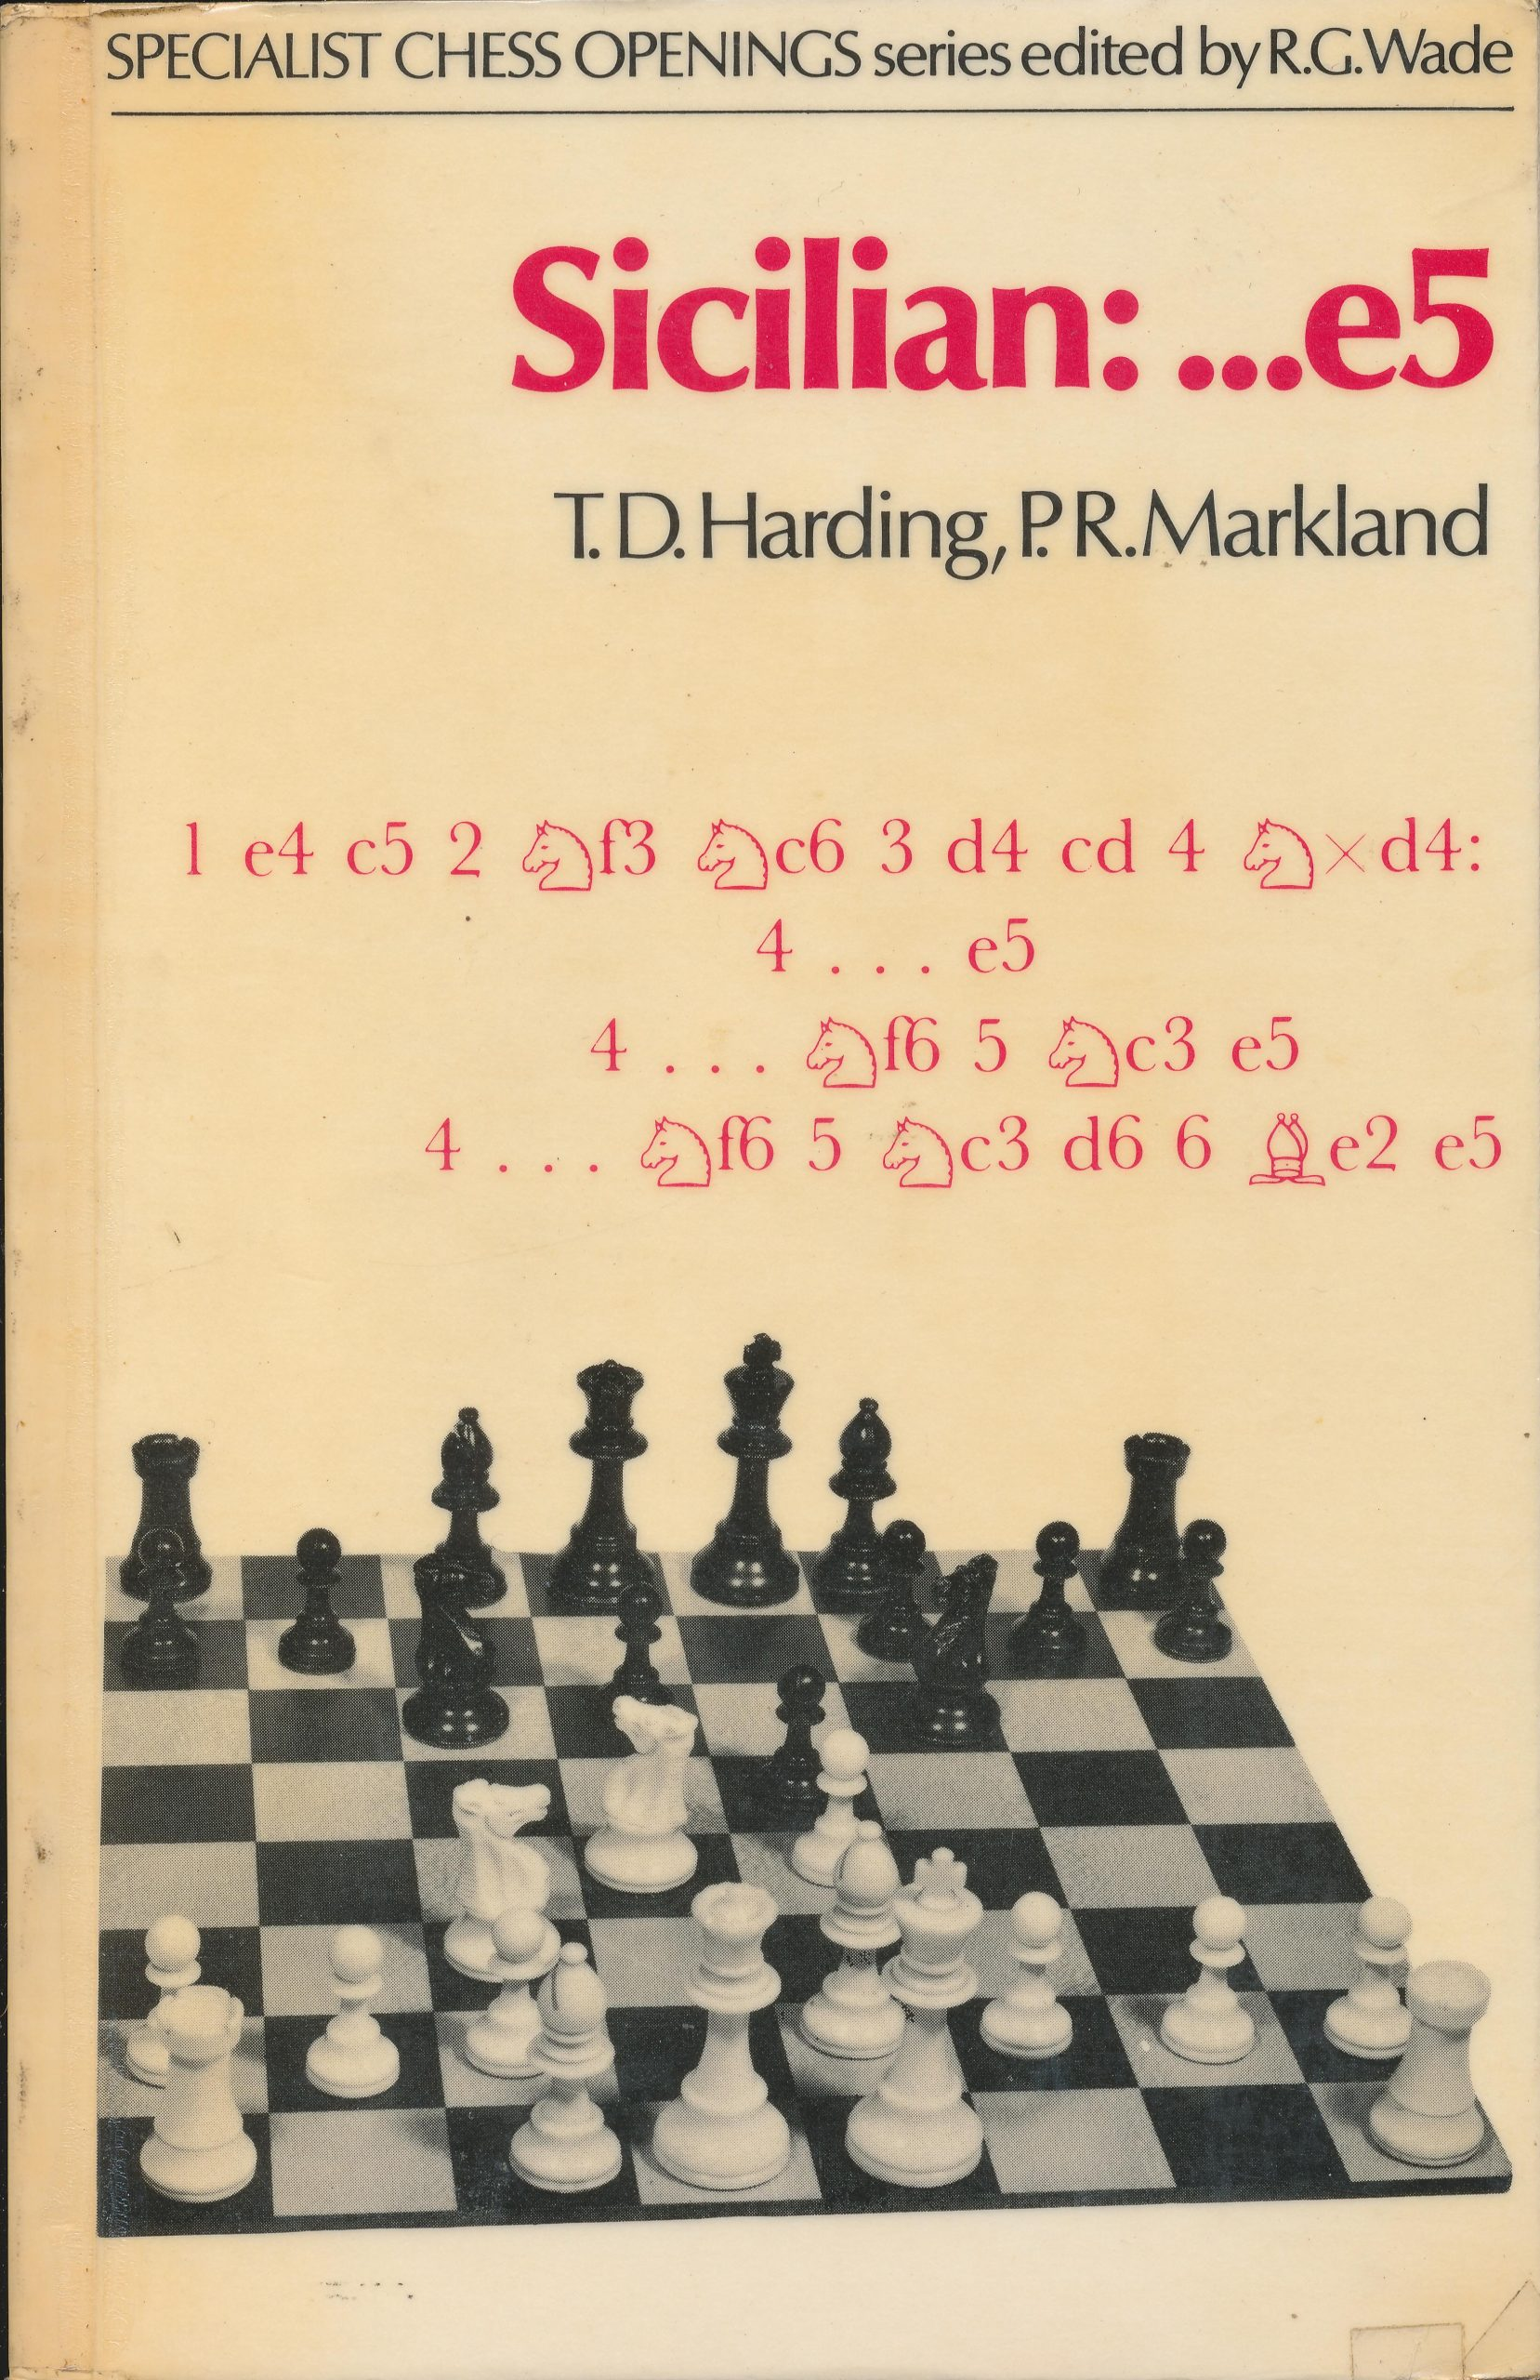 Sicilian:...e5 by TD Harding & PR Markland, Batsford, 1976, ISBN 0 7134 3209 8